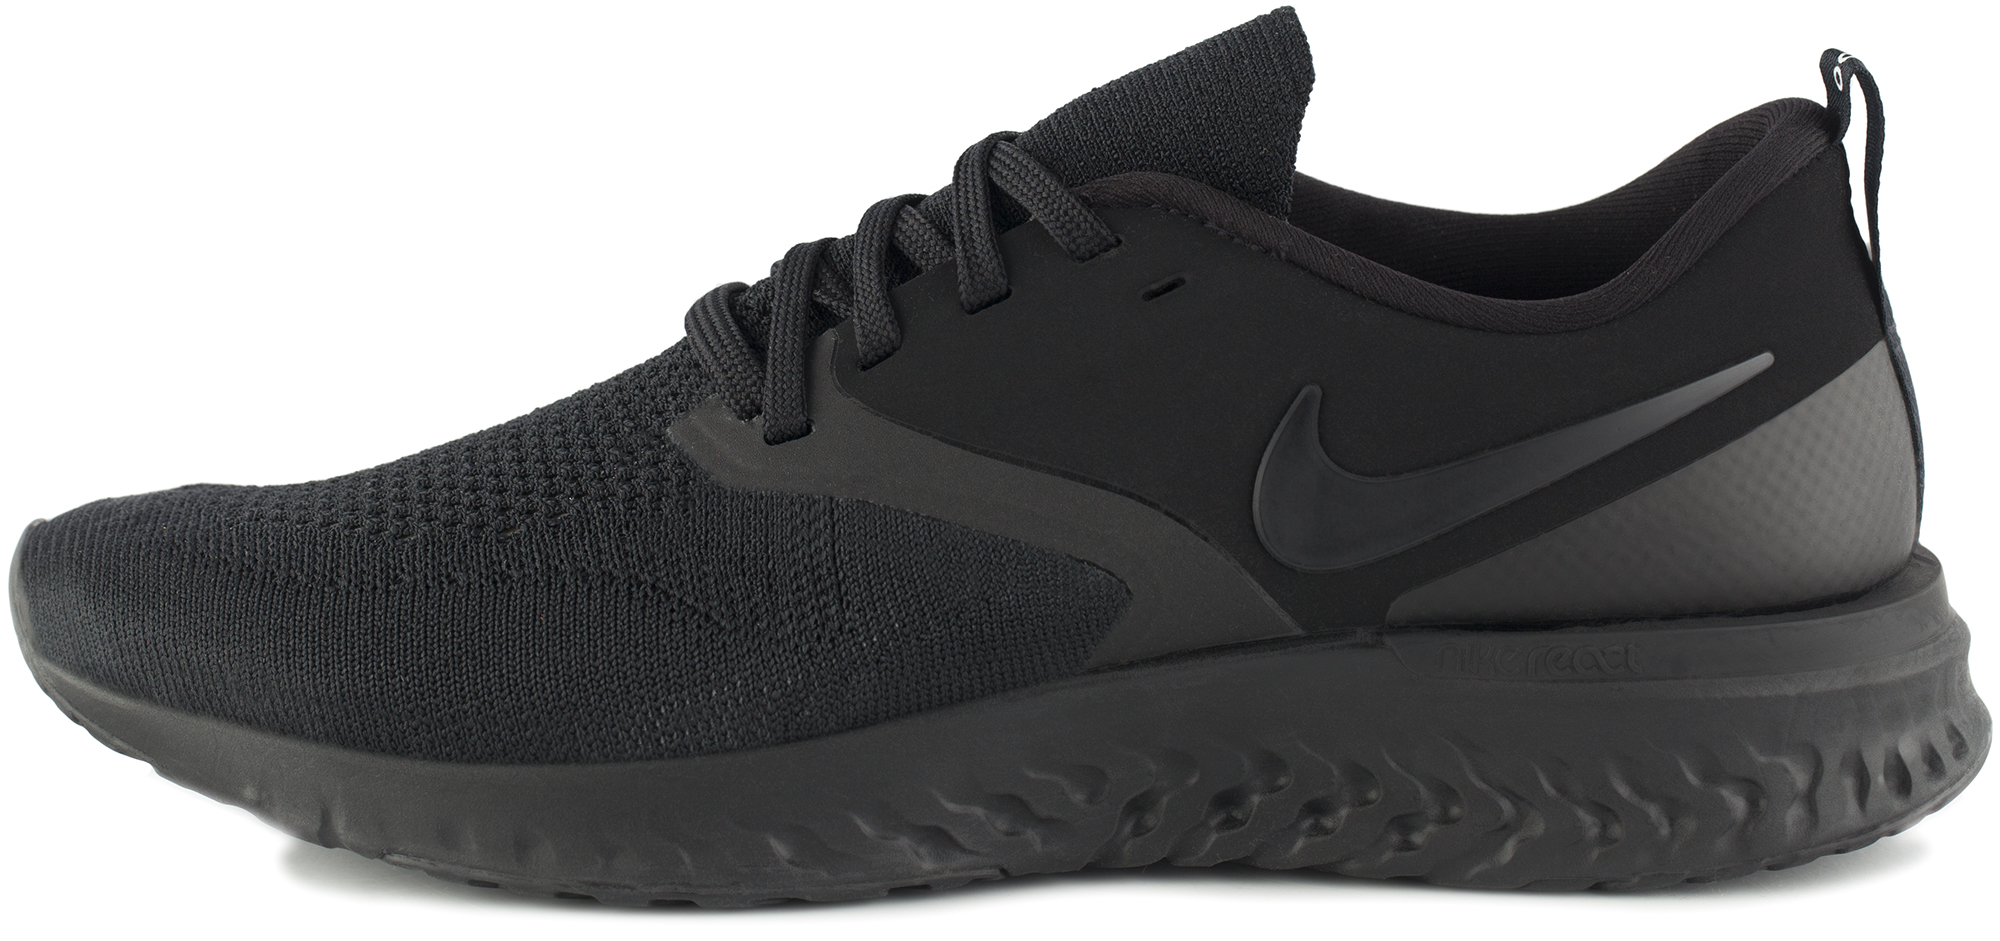 Nike Кроссовки женские Nike Odyssey React 2 Flyknit, размер 37,5 цена